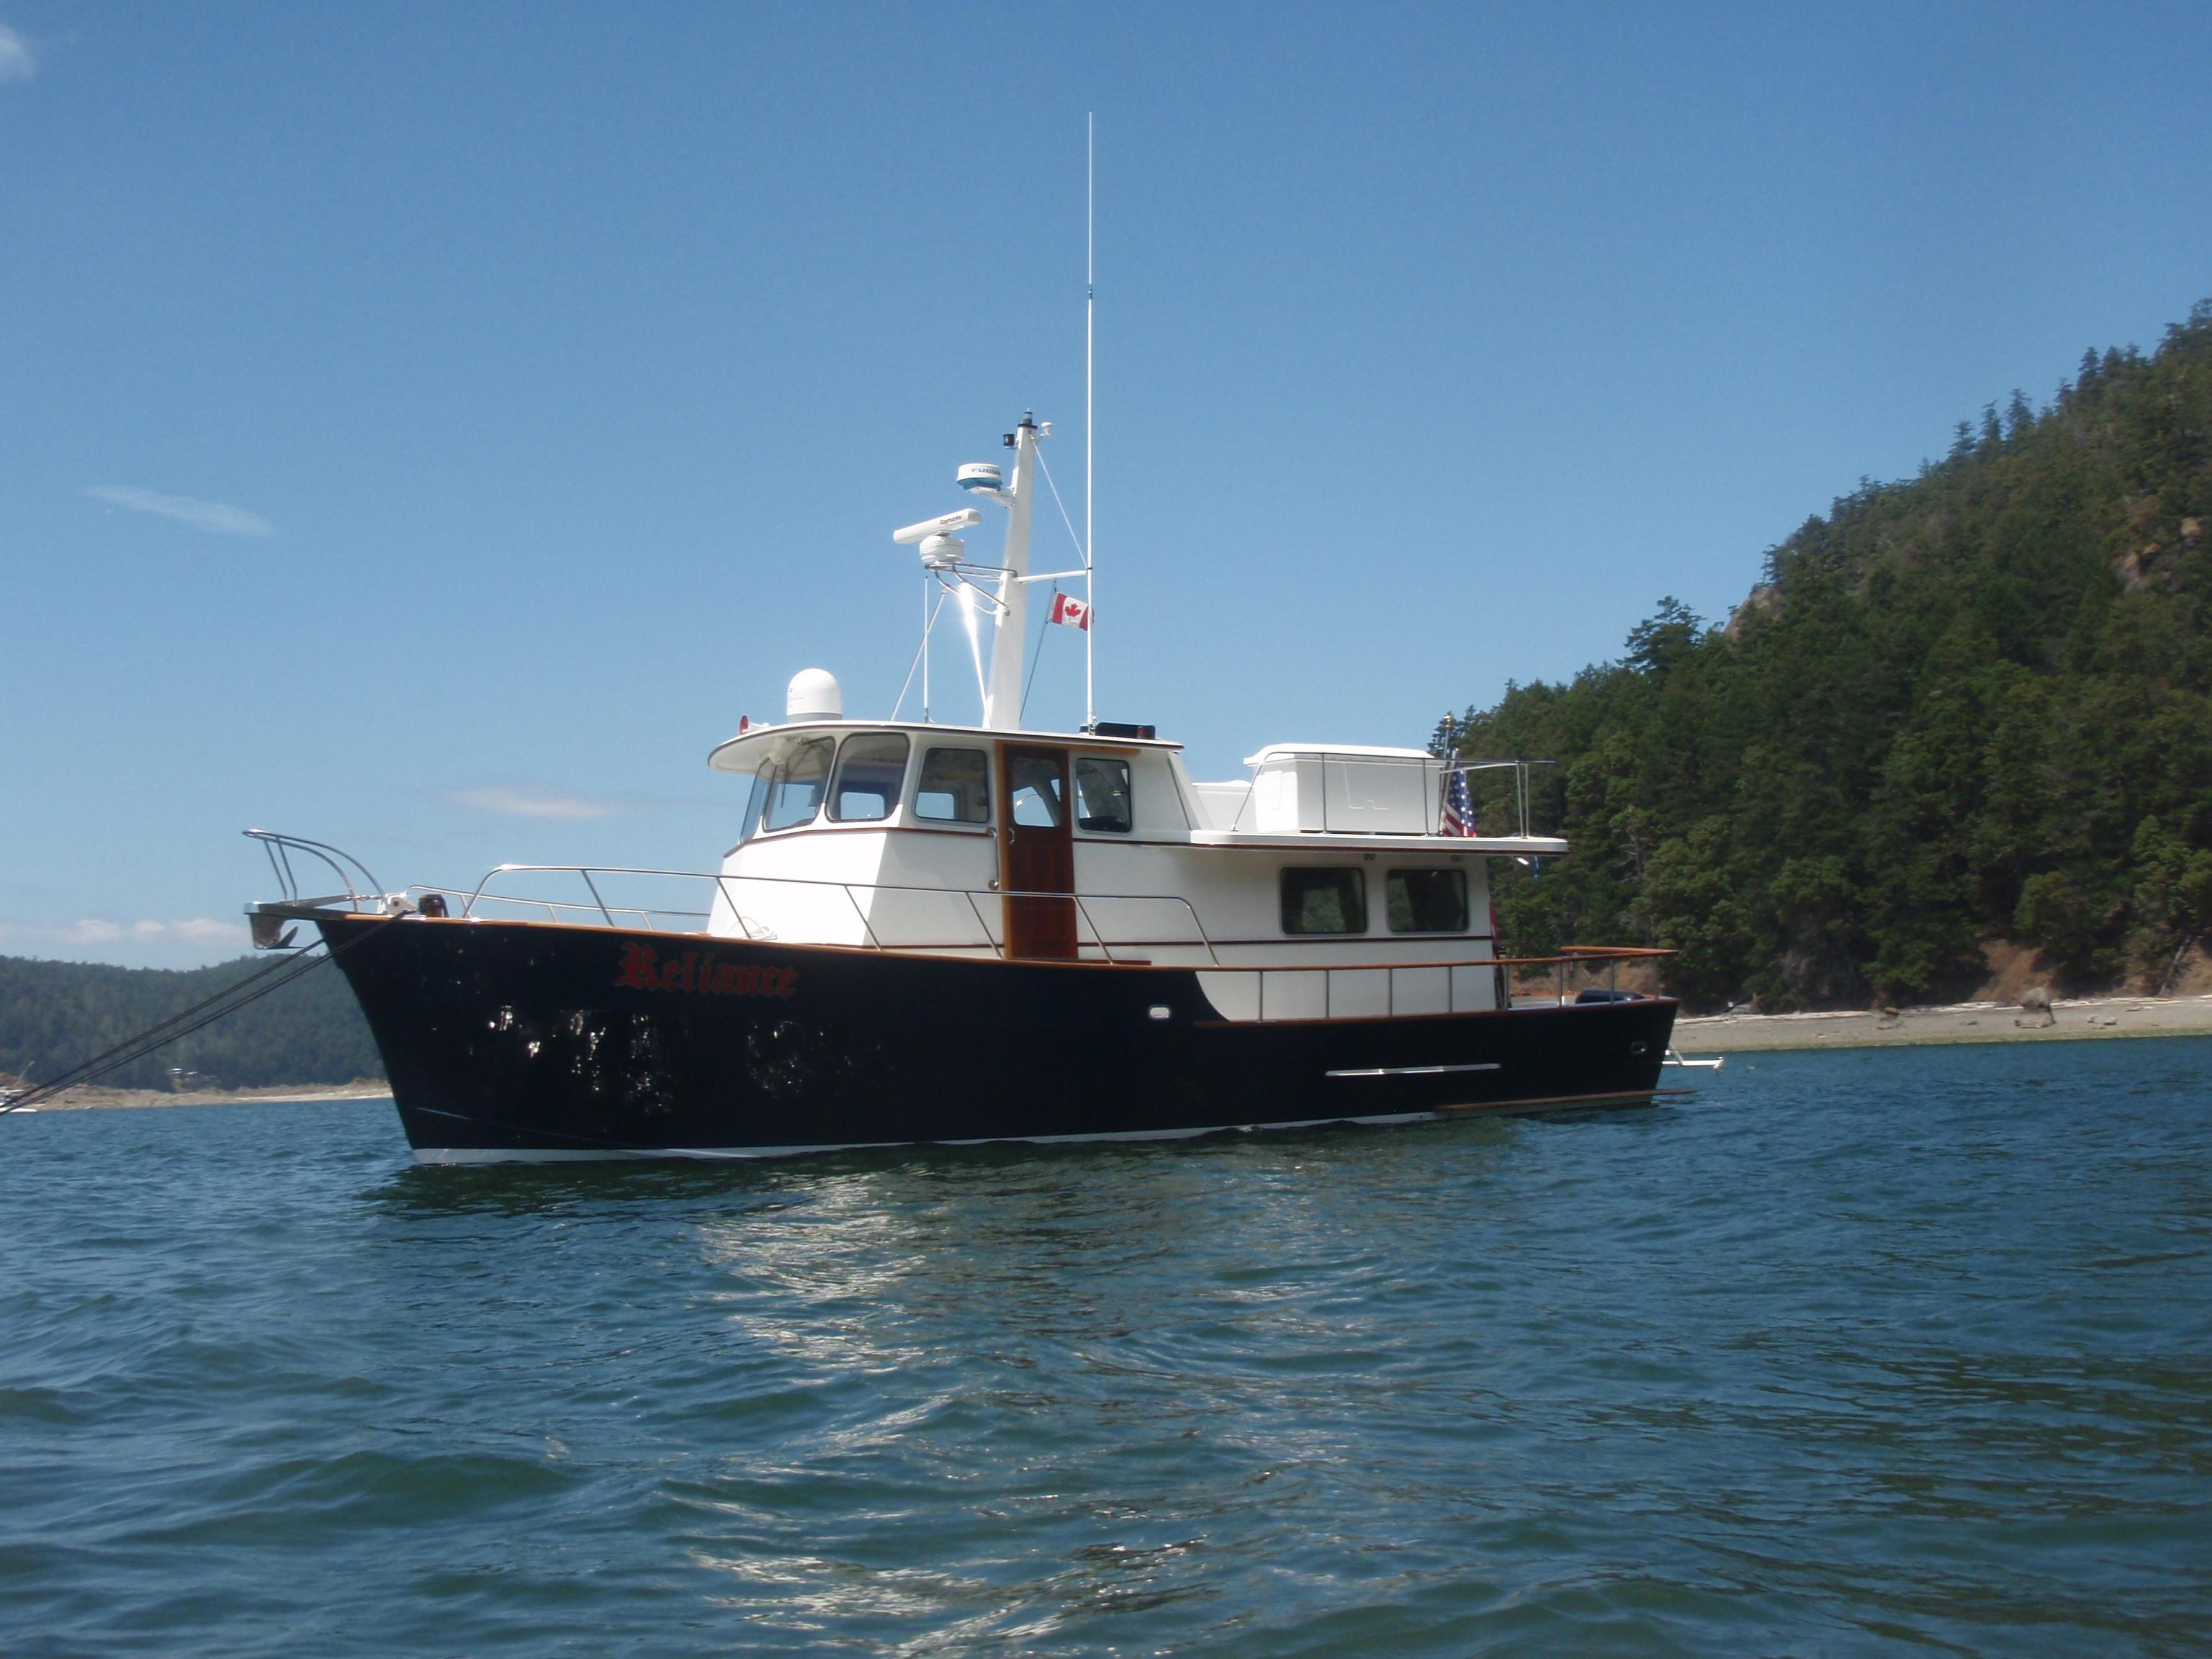 47 ft 1986 san pedro boat works trawler